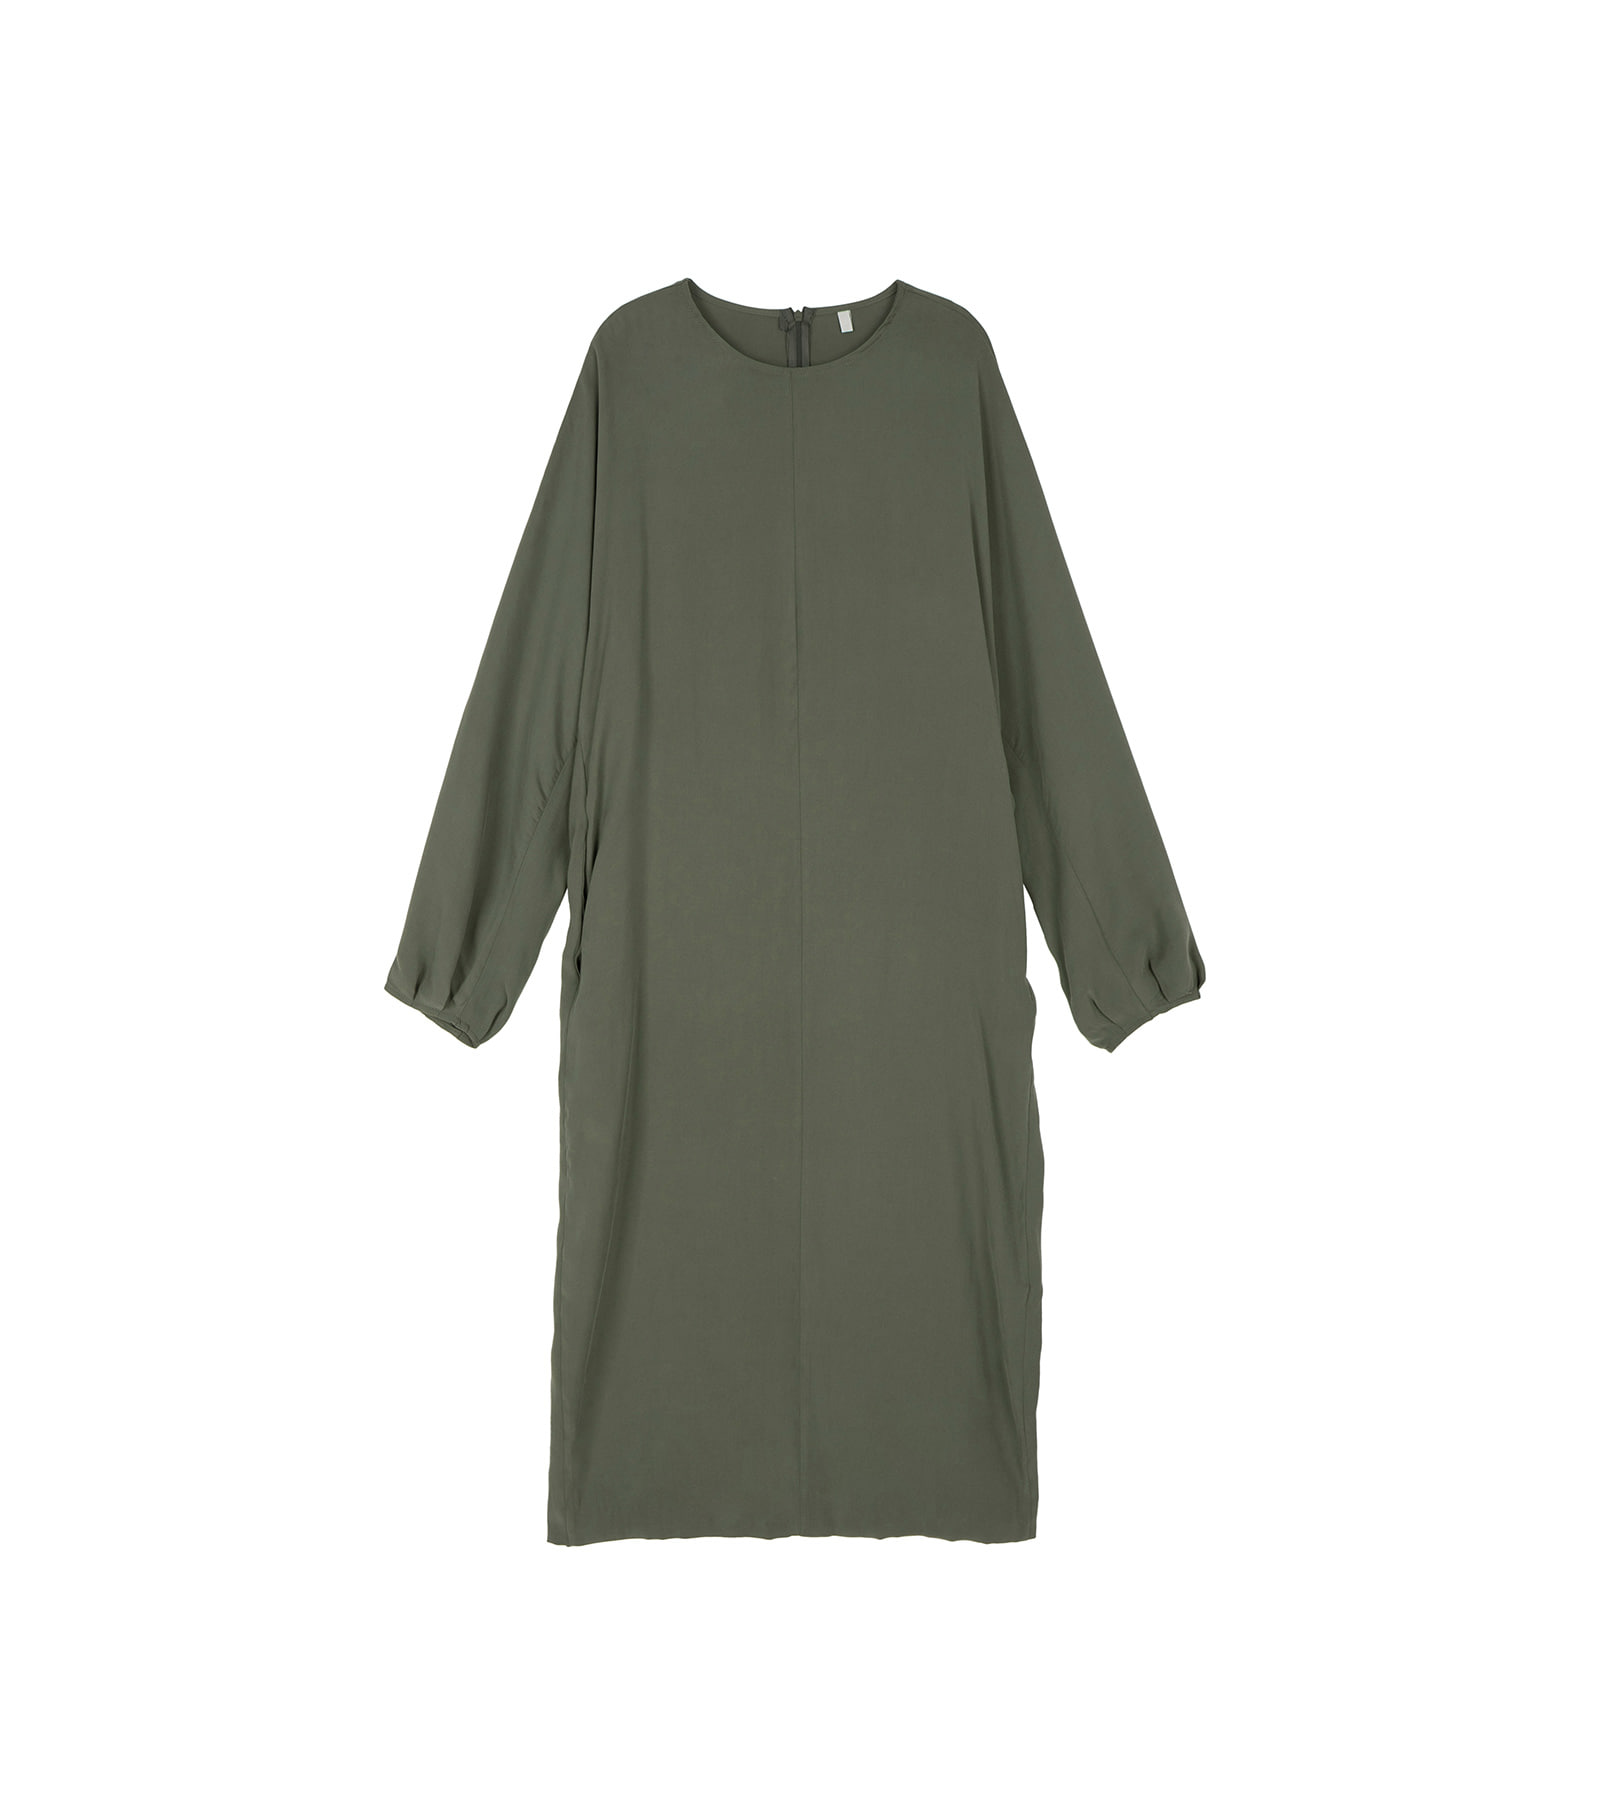 Olivy overfit maxi dress